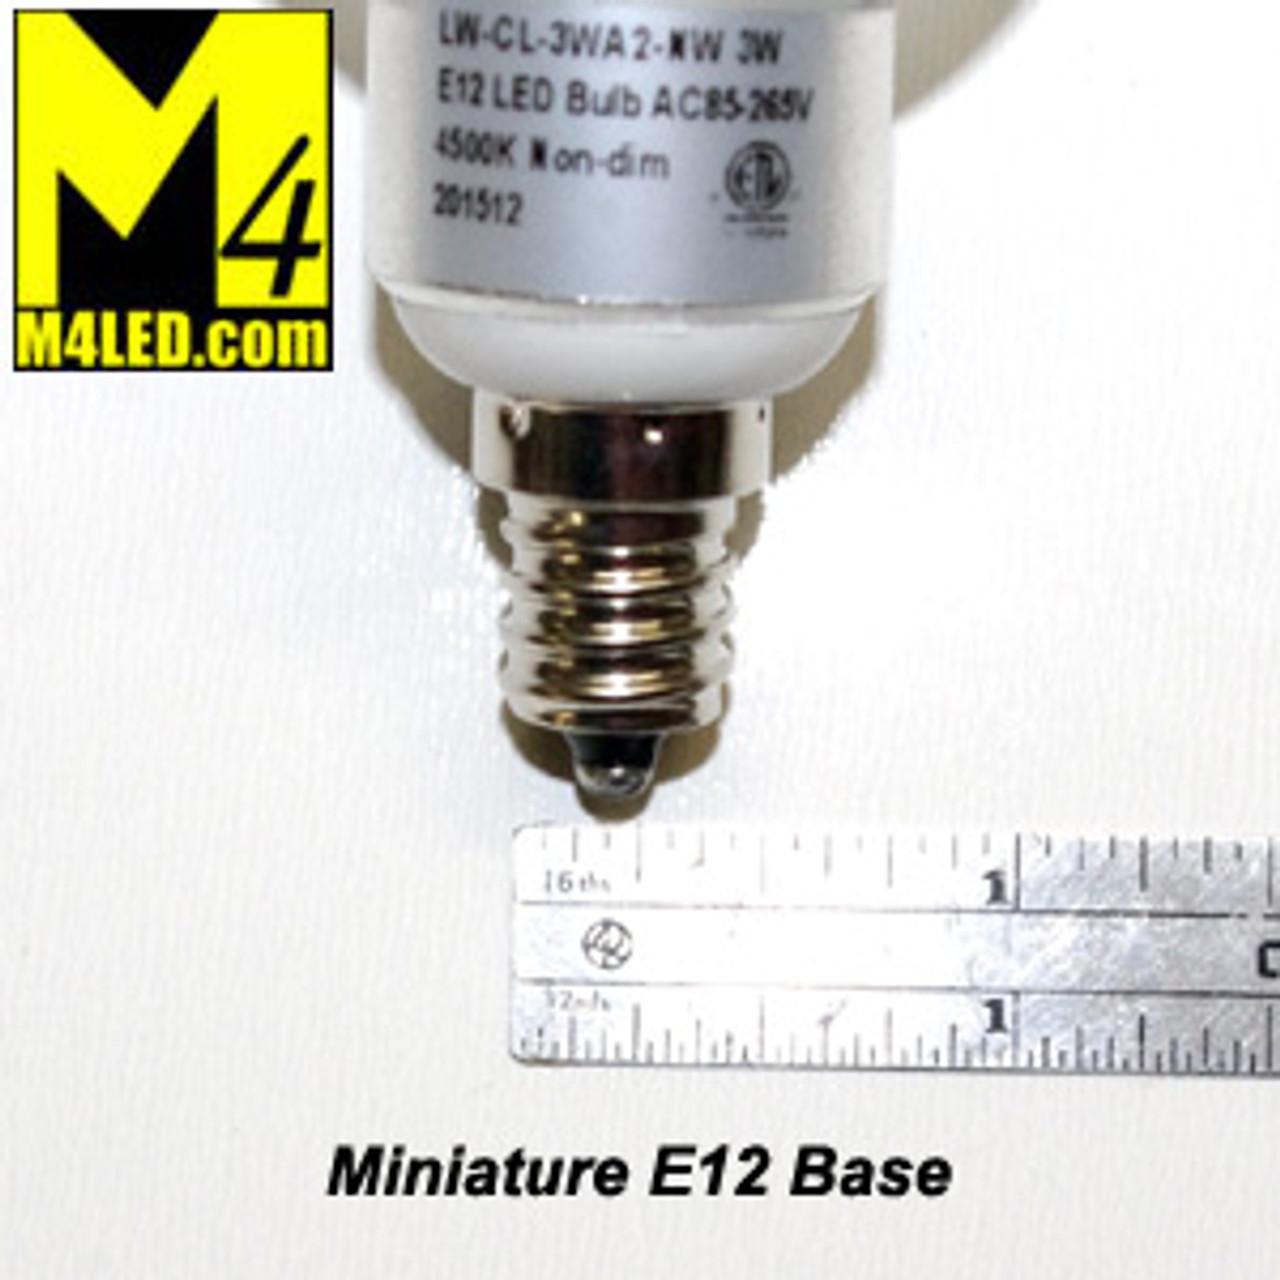 Home or RV LV-CL-3WA2-NW 120v Natural White Screw in Vanity Globe with Mini E12 Base